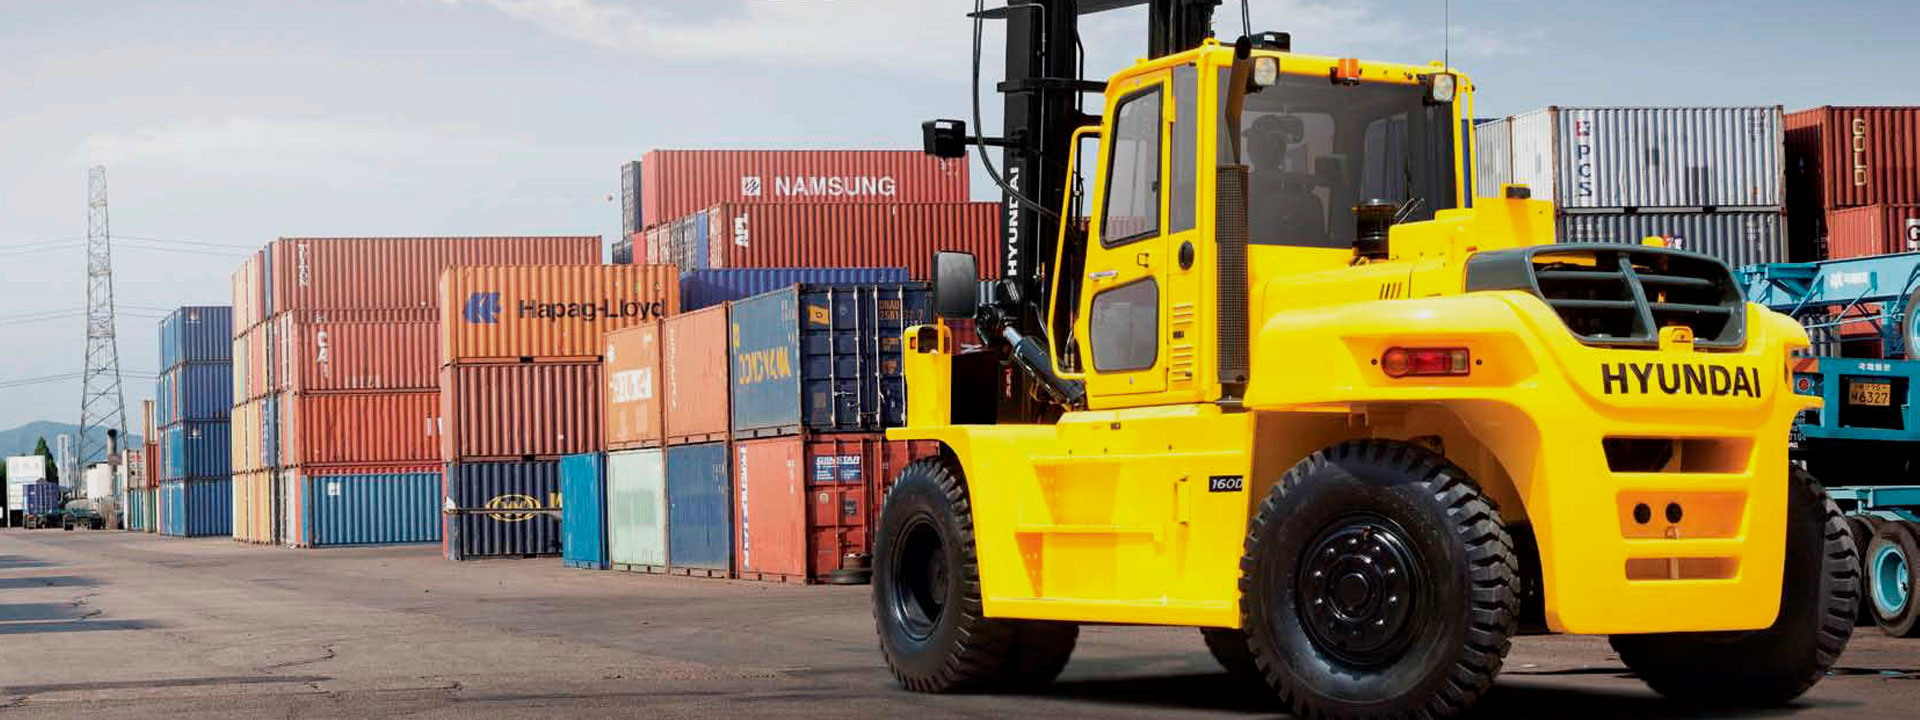 Hyundai Forklifts New Zealand